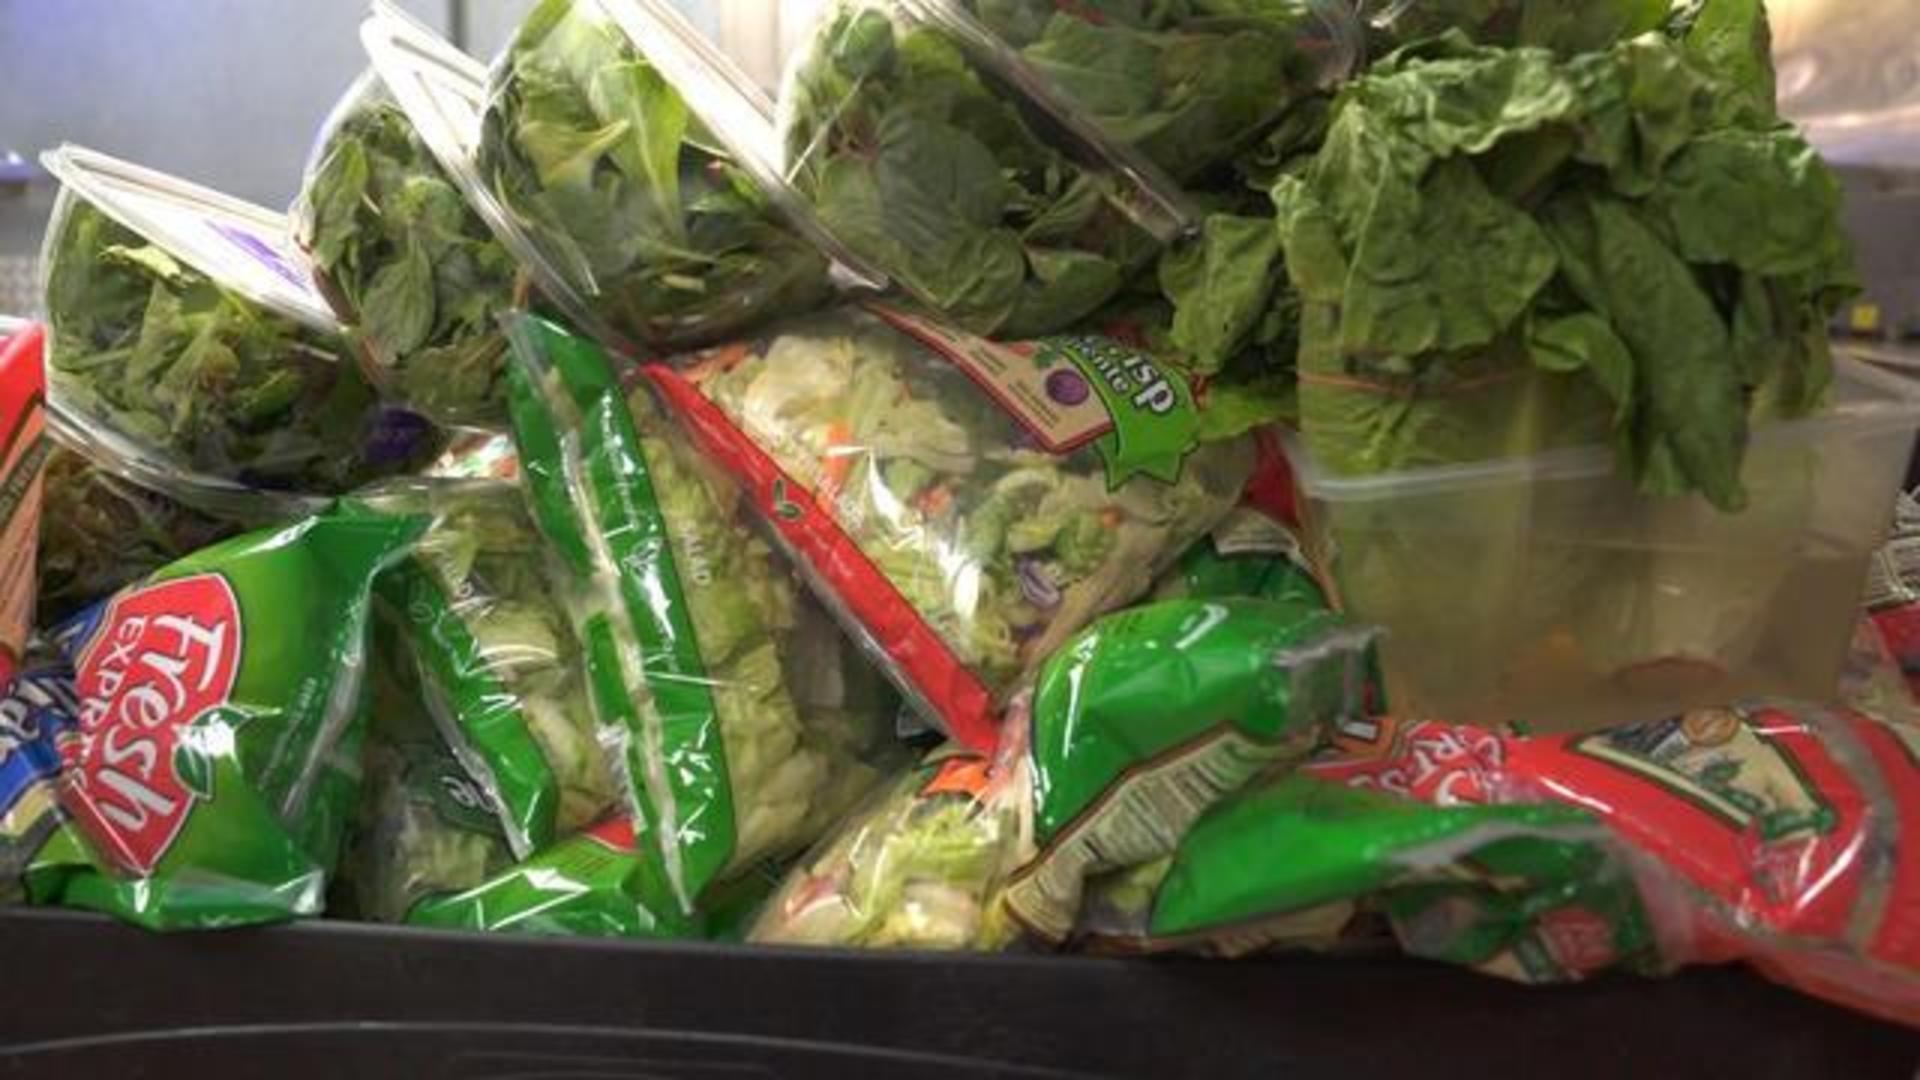 Lettuce Warnings For Christmas 2021 Romaine Lettuce Pulled From Shelves Amid Another E Coli Outbreak Cbs News